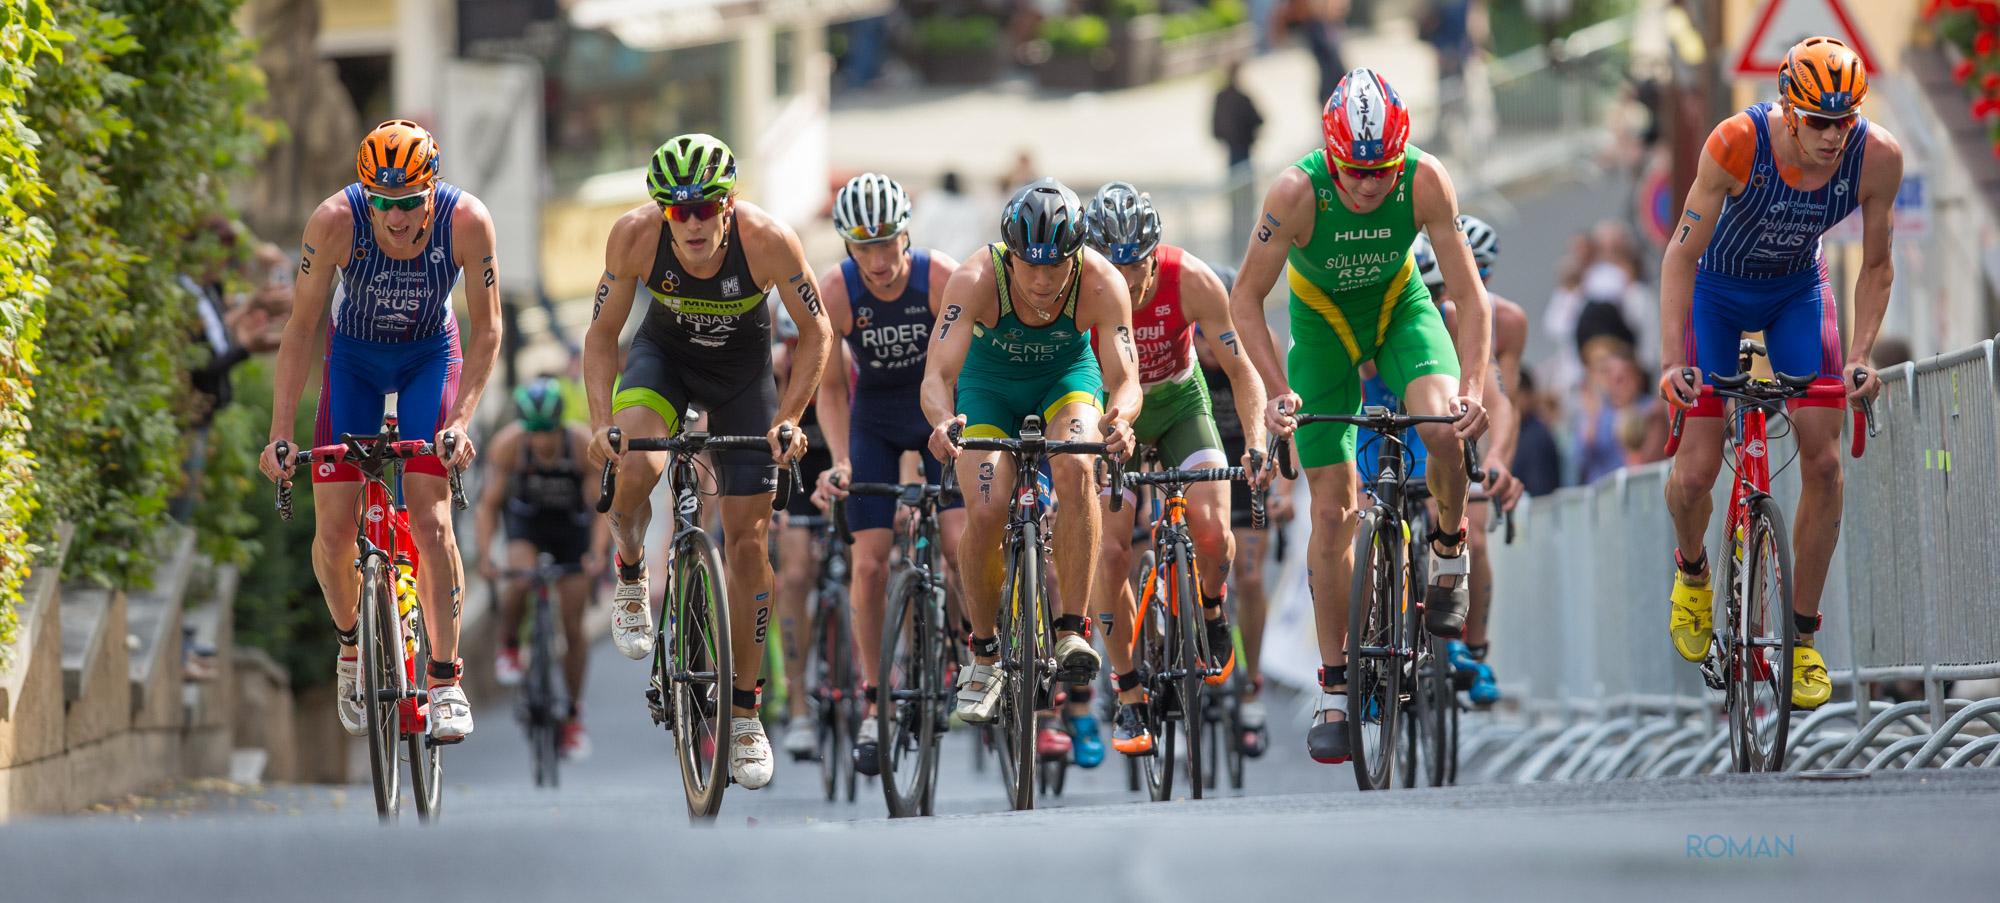 ICU_World_Cup_Triathlon_KV-38